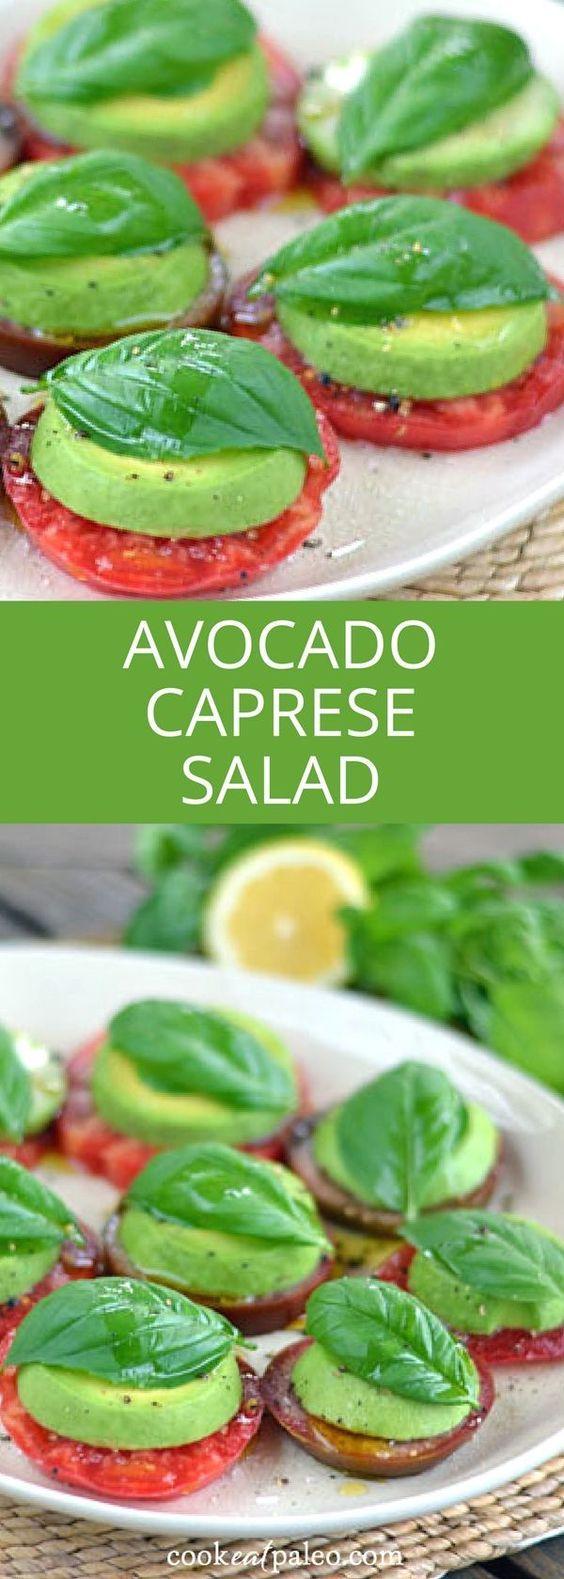 tomatoes avocado avocado salads tomatoes salads paleo basil dairy free ...